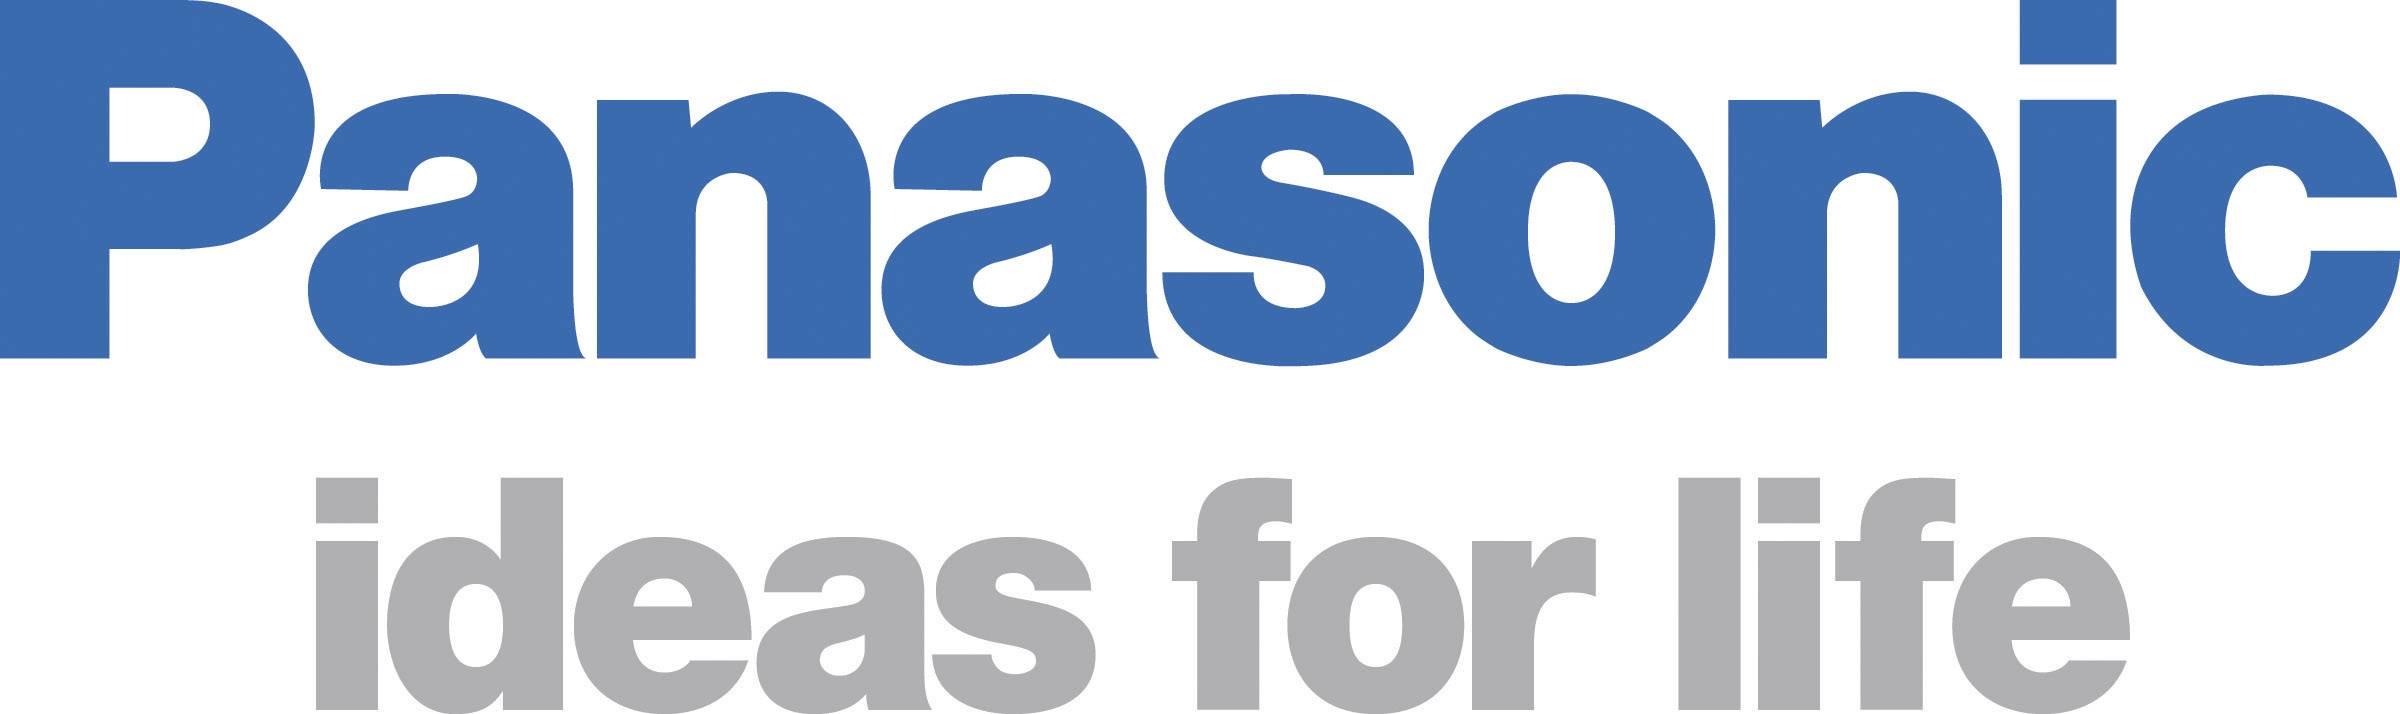 Panasonic (PLC)